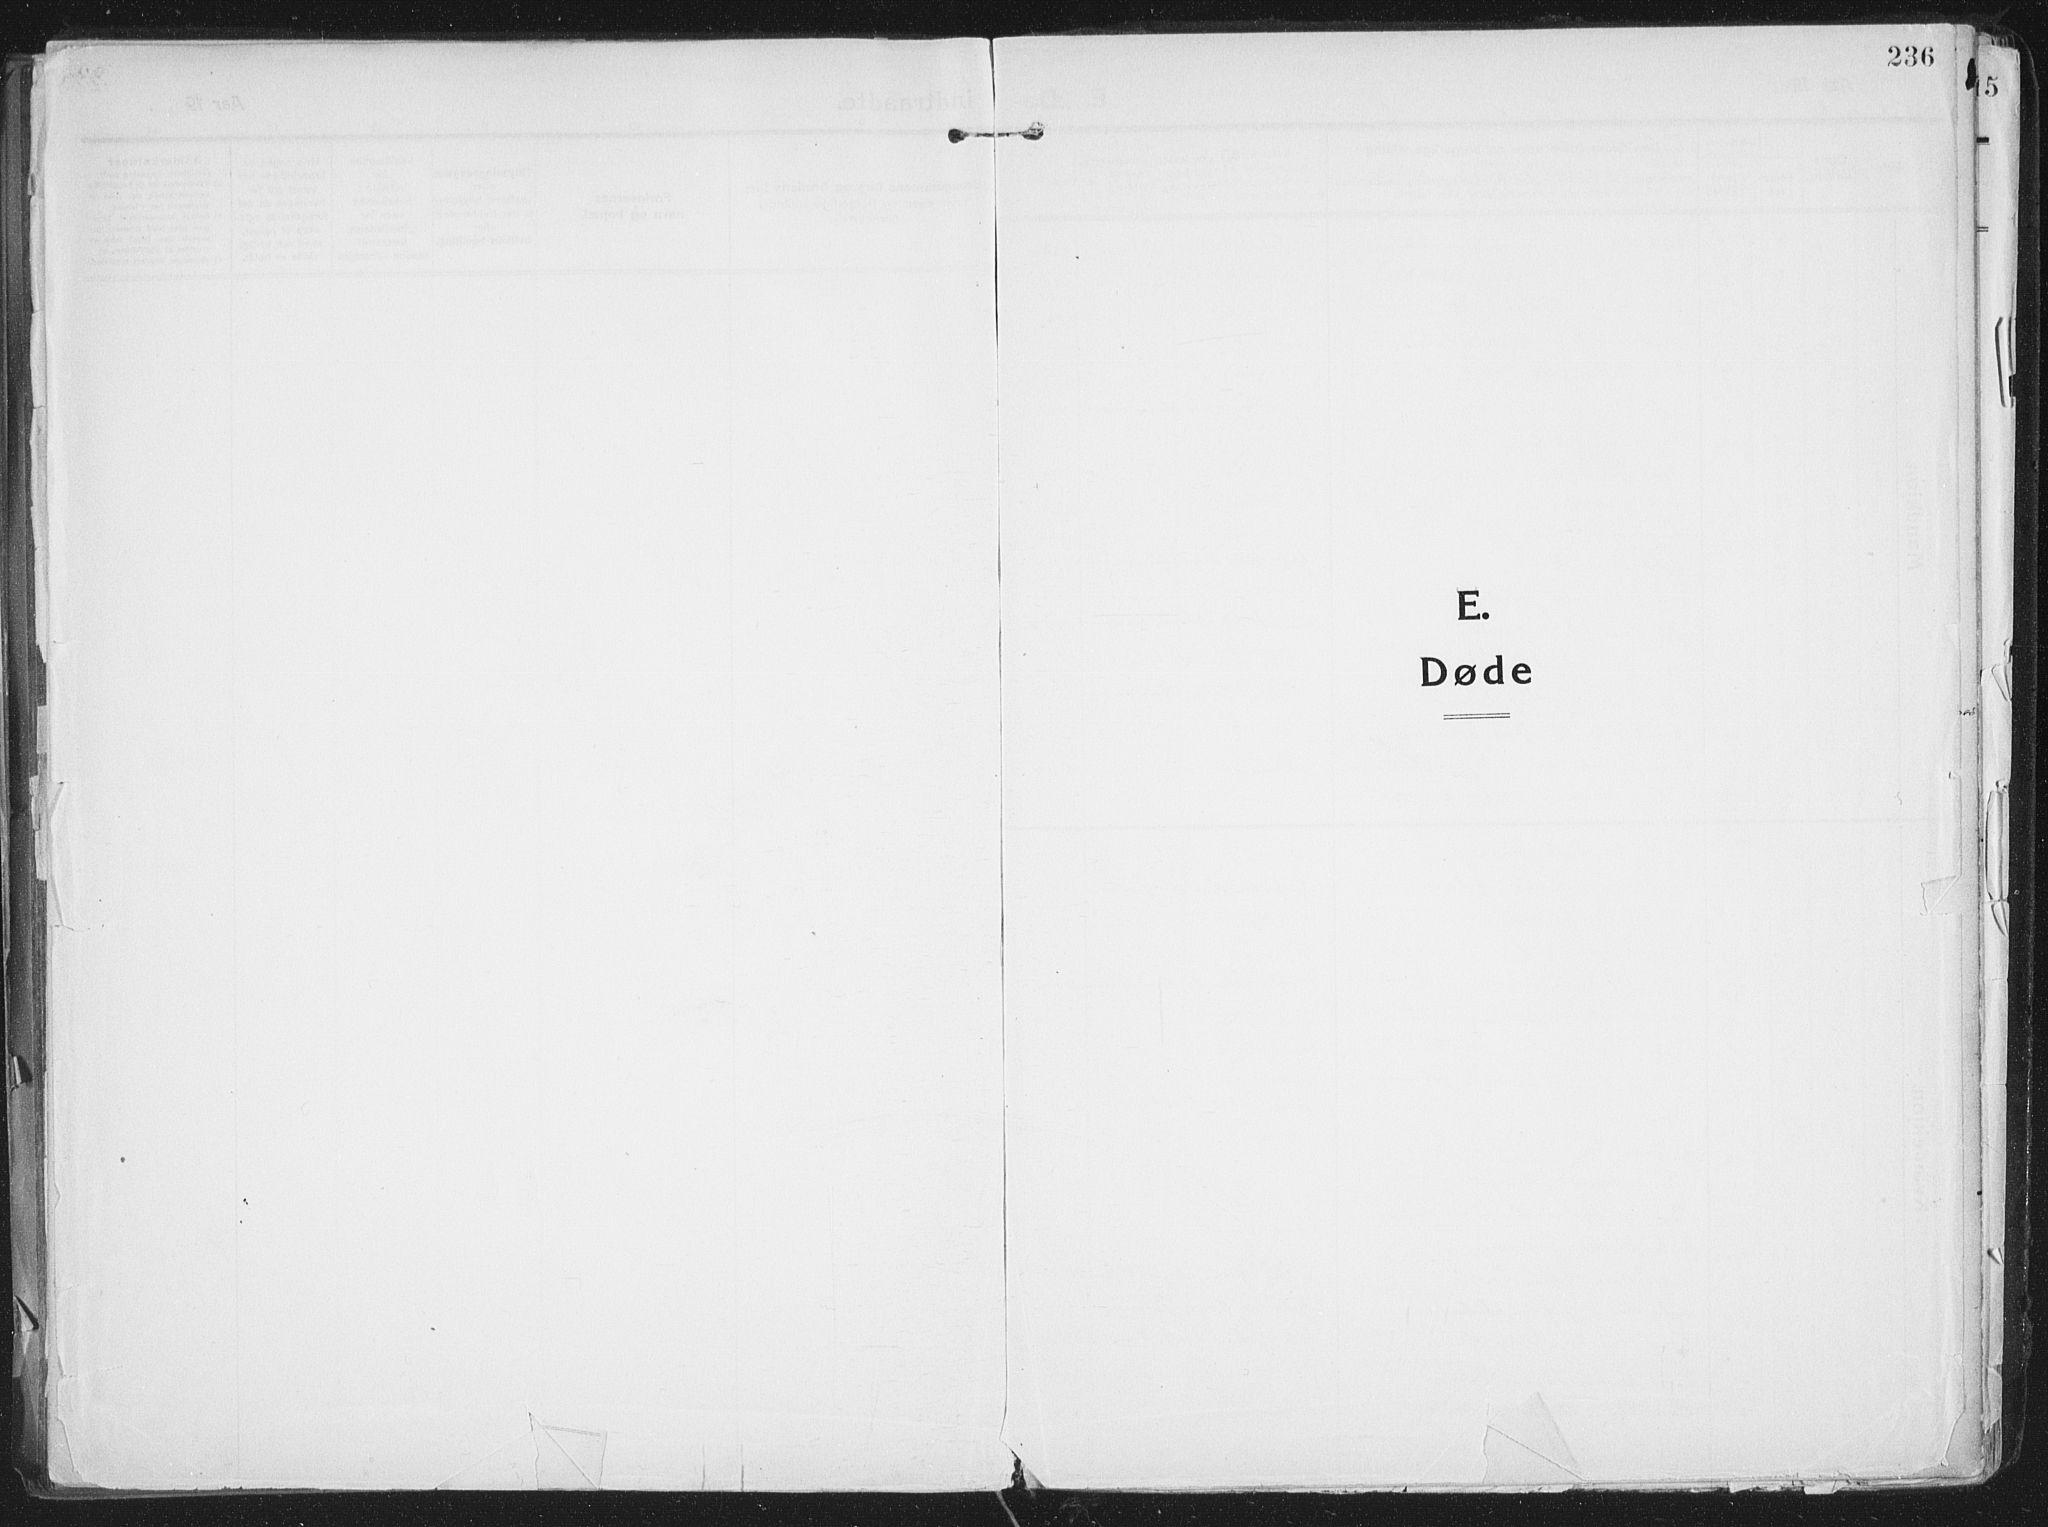 SATØ, Lenvik sokneprestembete, H/Ha: Ministerialbok nr. 16, 1910-1924, s. 236